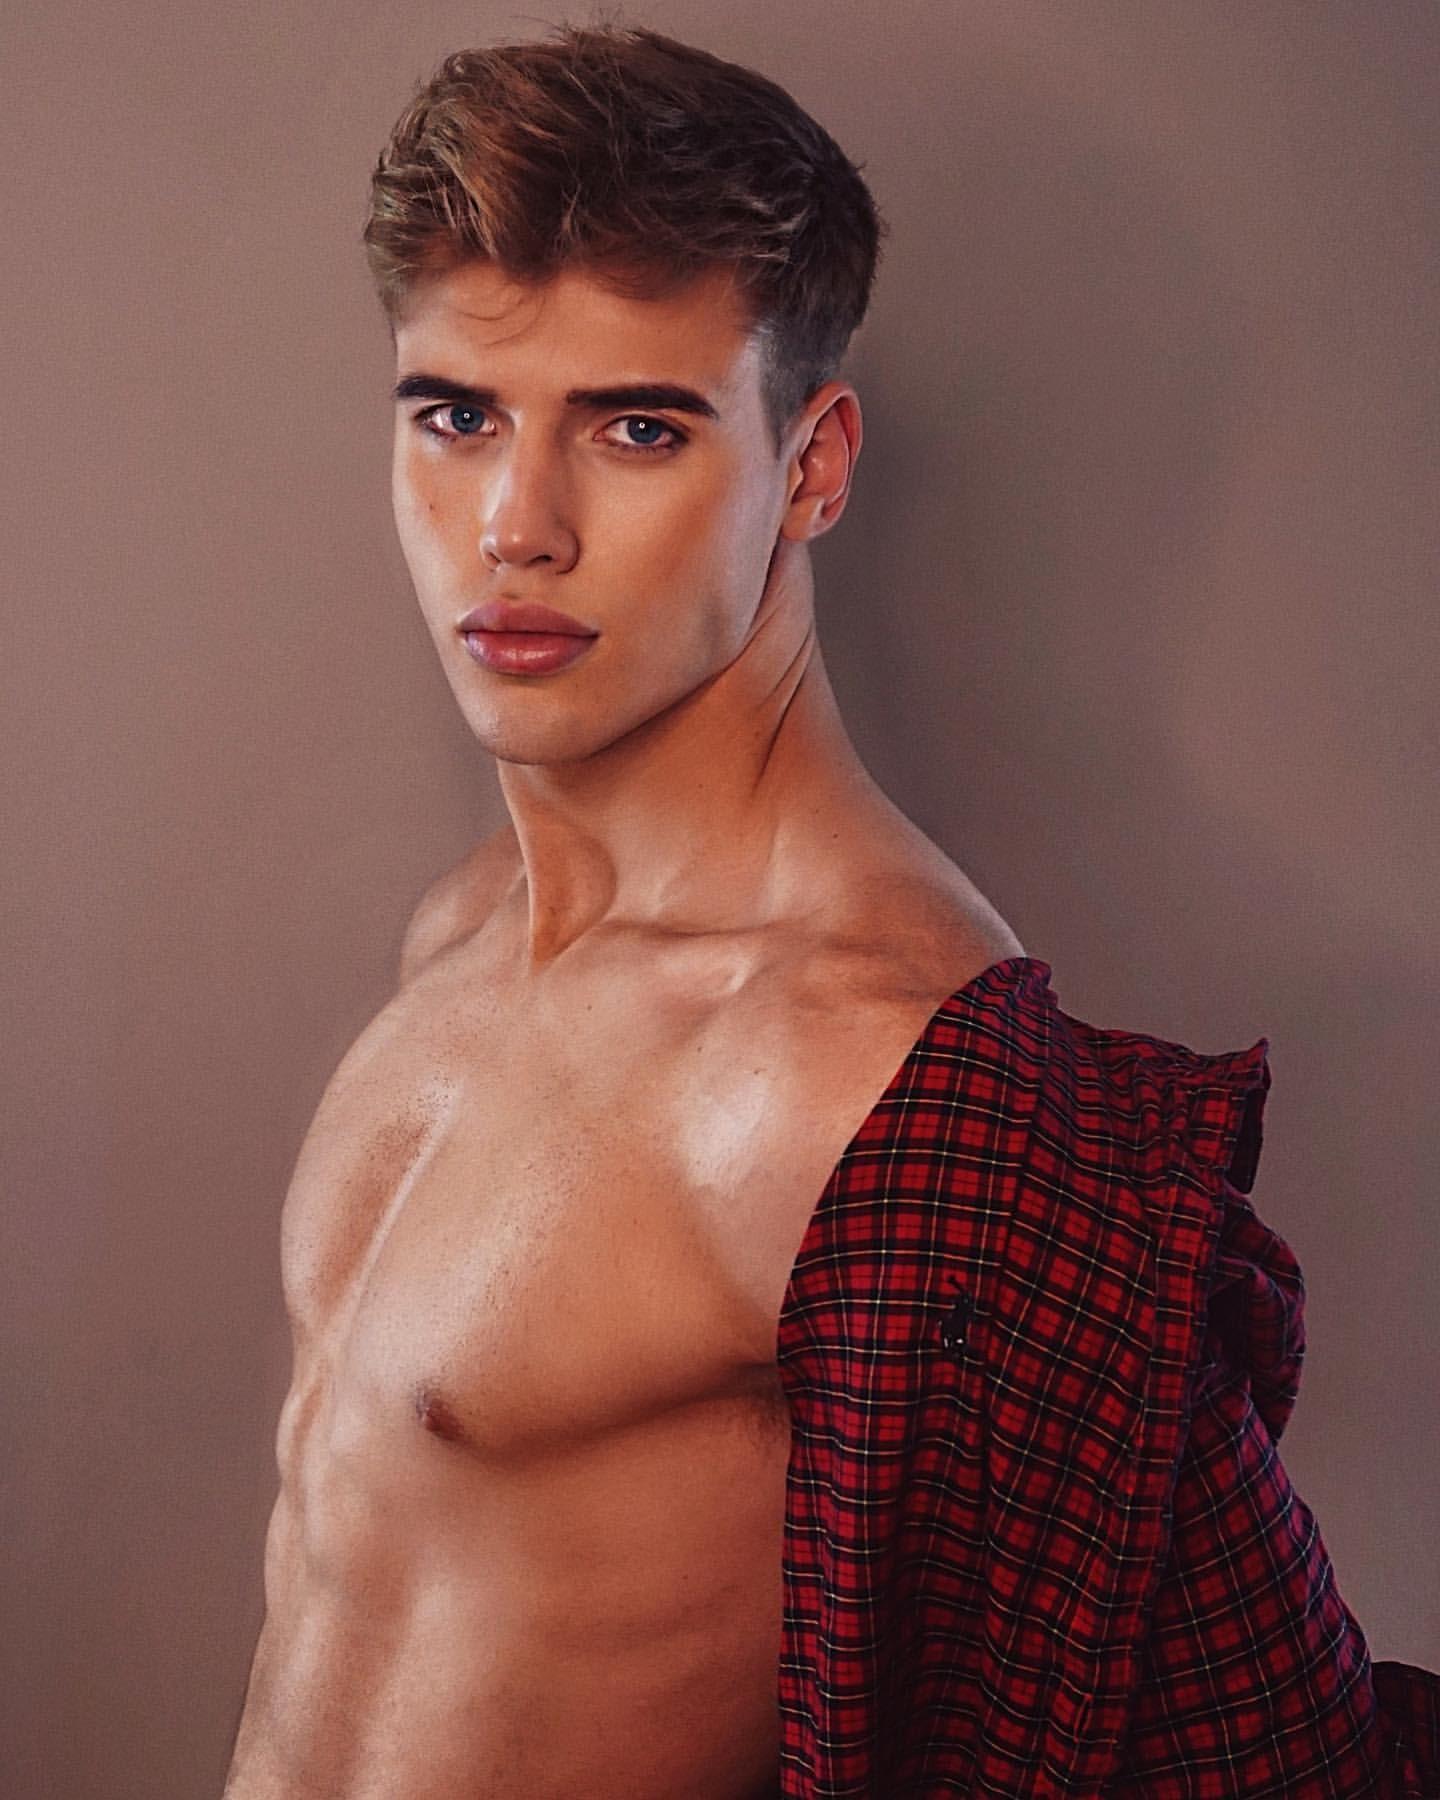 Pin by Nae Tsm2 on Stunning Men   Cute white guys, Healthy